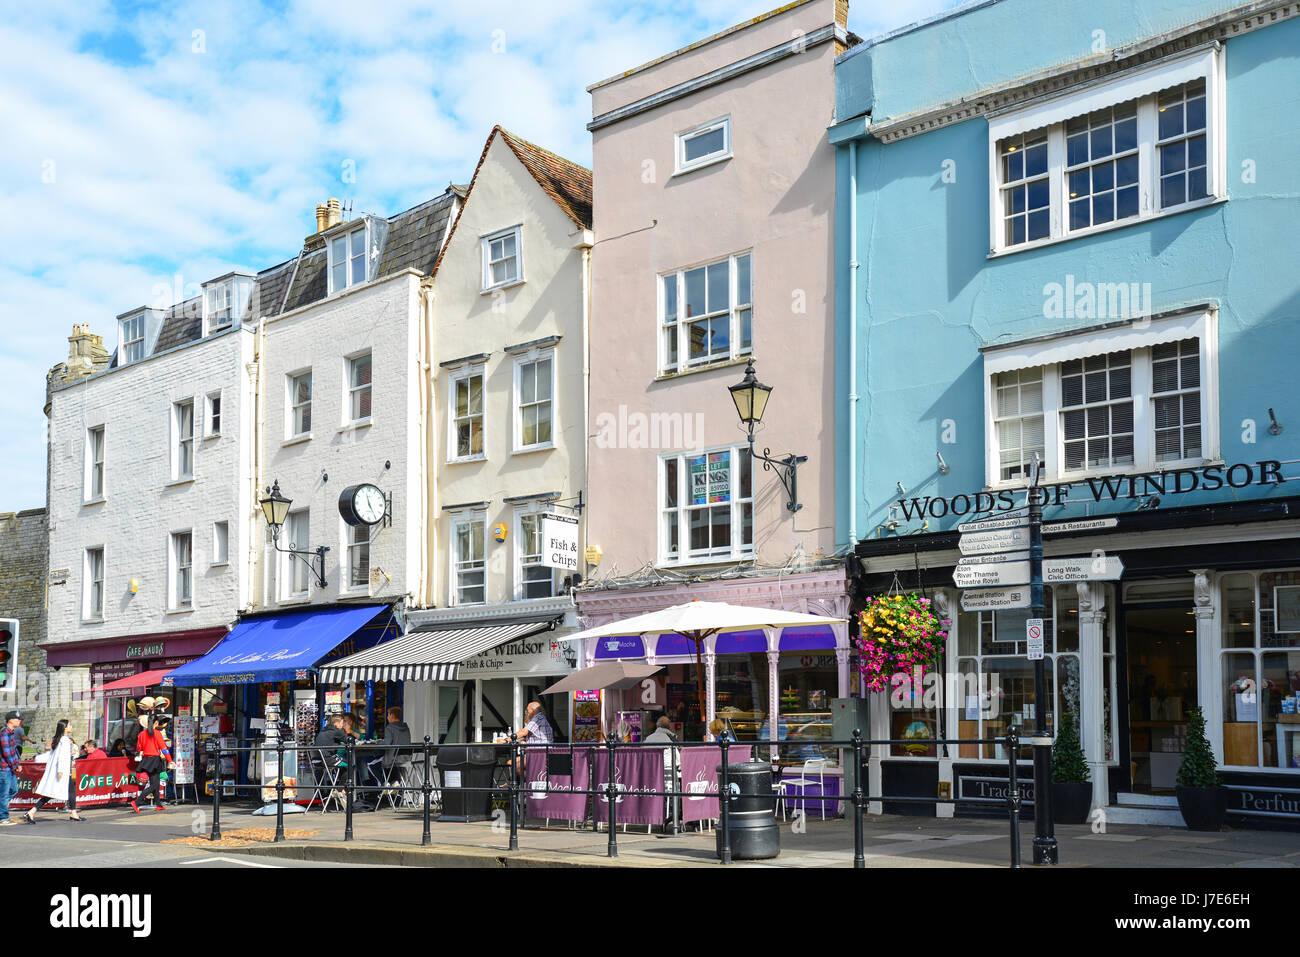 High Street, Windsor, Berkshire, England, United Kingdom - Stock Image